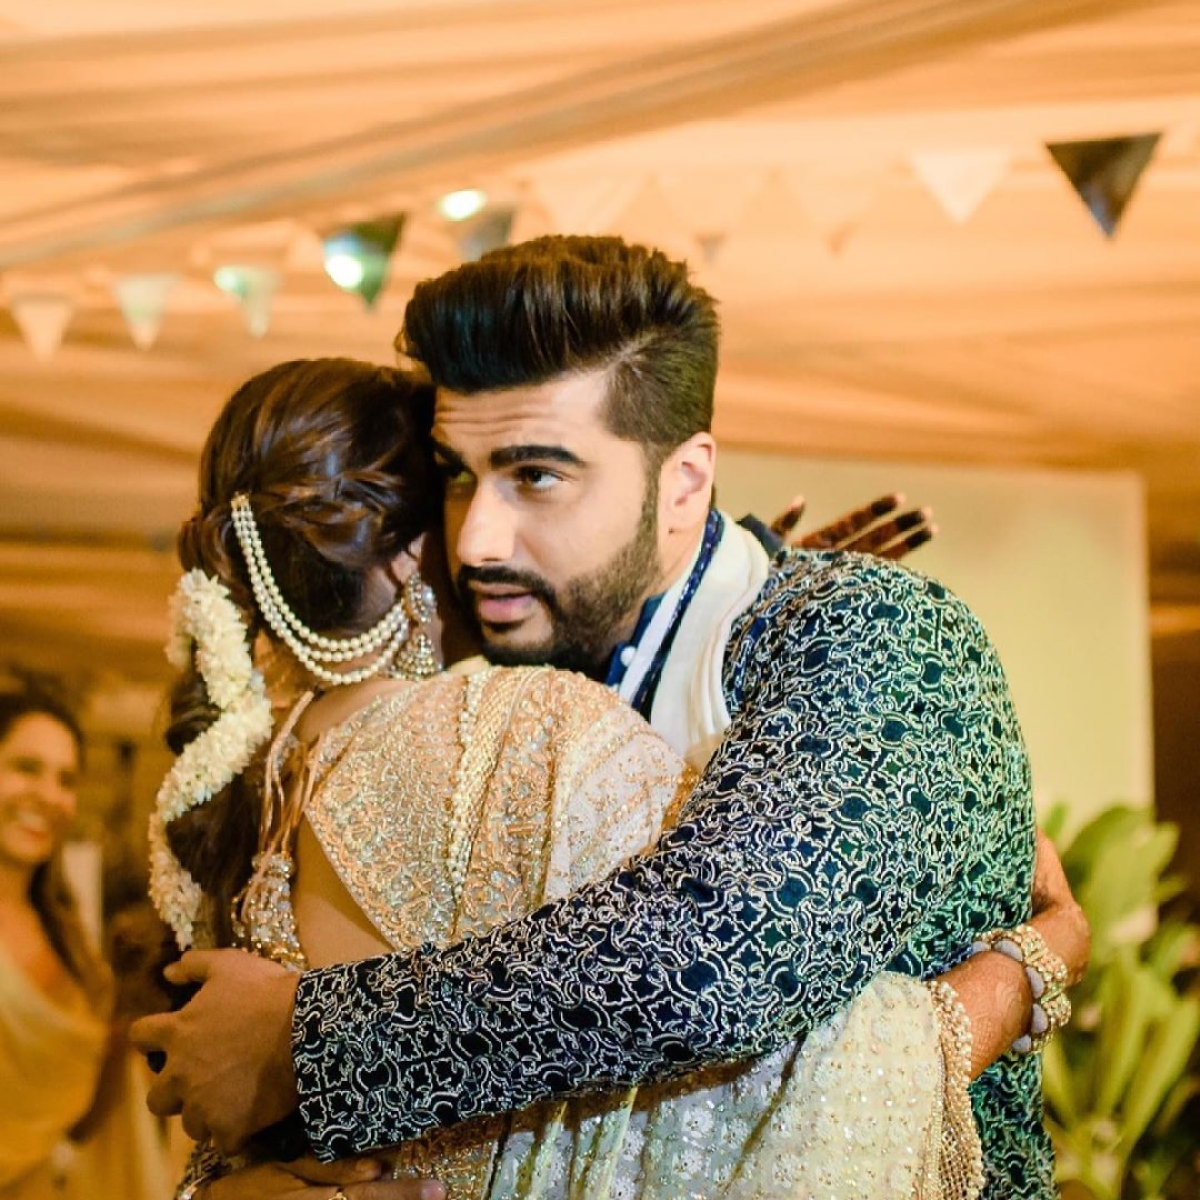 Sonam Kapoor Ahuja wishes 'darling brother' Arjun Kapoor on 35th birthday